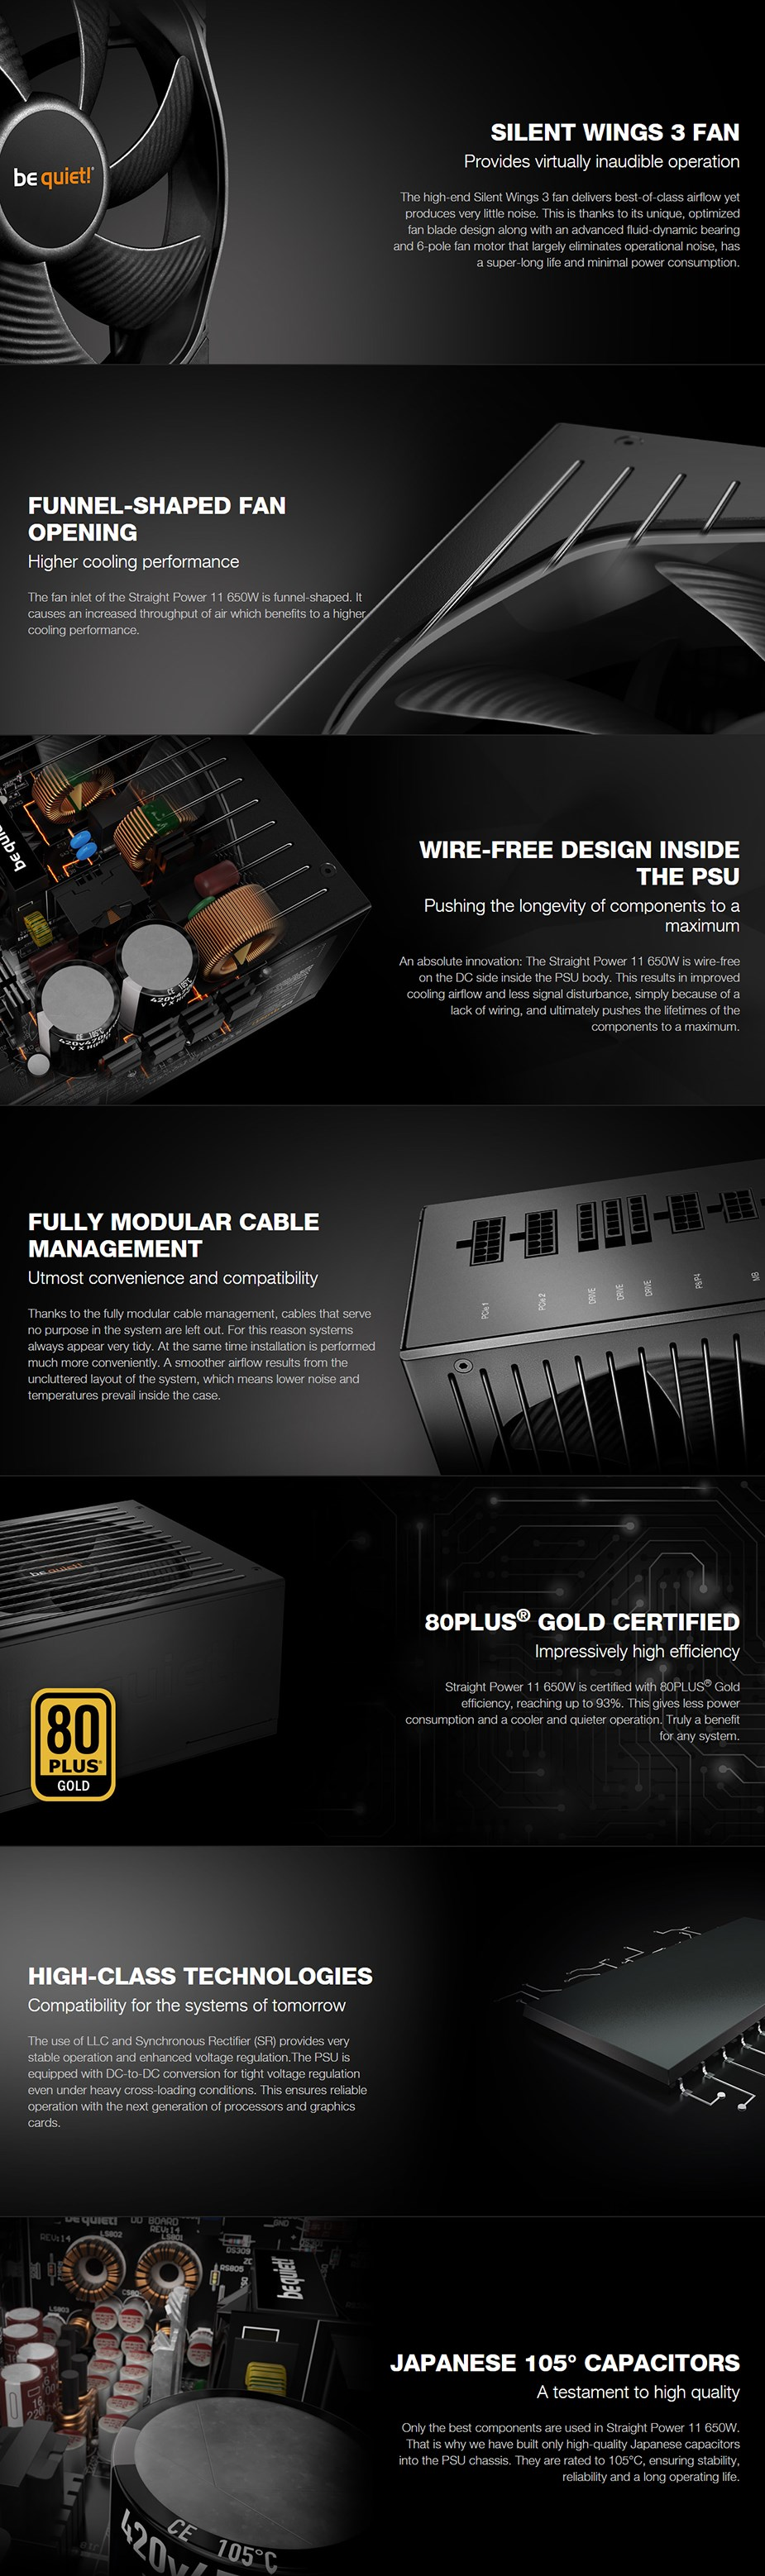 be quiet! Straight Power 11 650W 80+ Gold Modular Power Supply - Desktop Overview 1